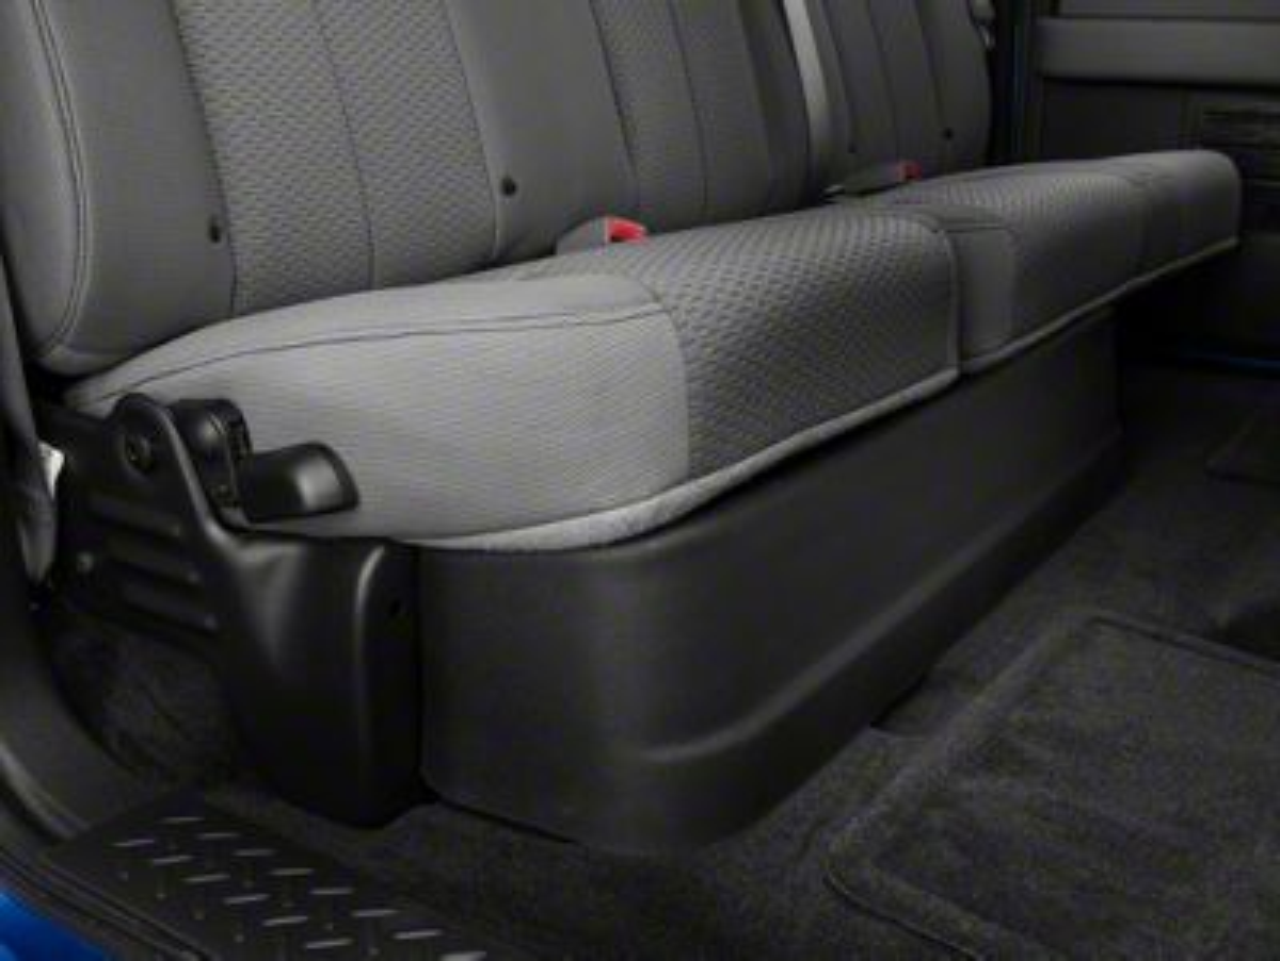 Husky Gearbox Under Seat Storage Box (09-14 F-150 SuperCab)